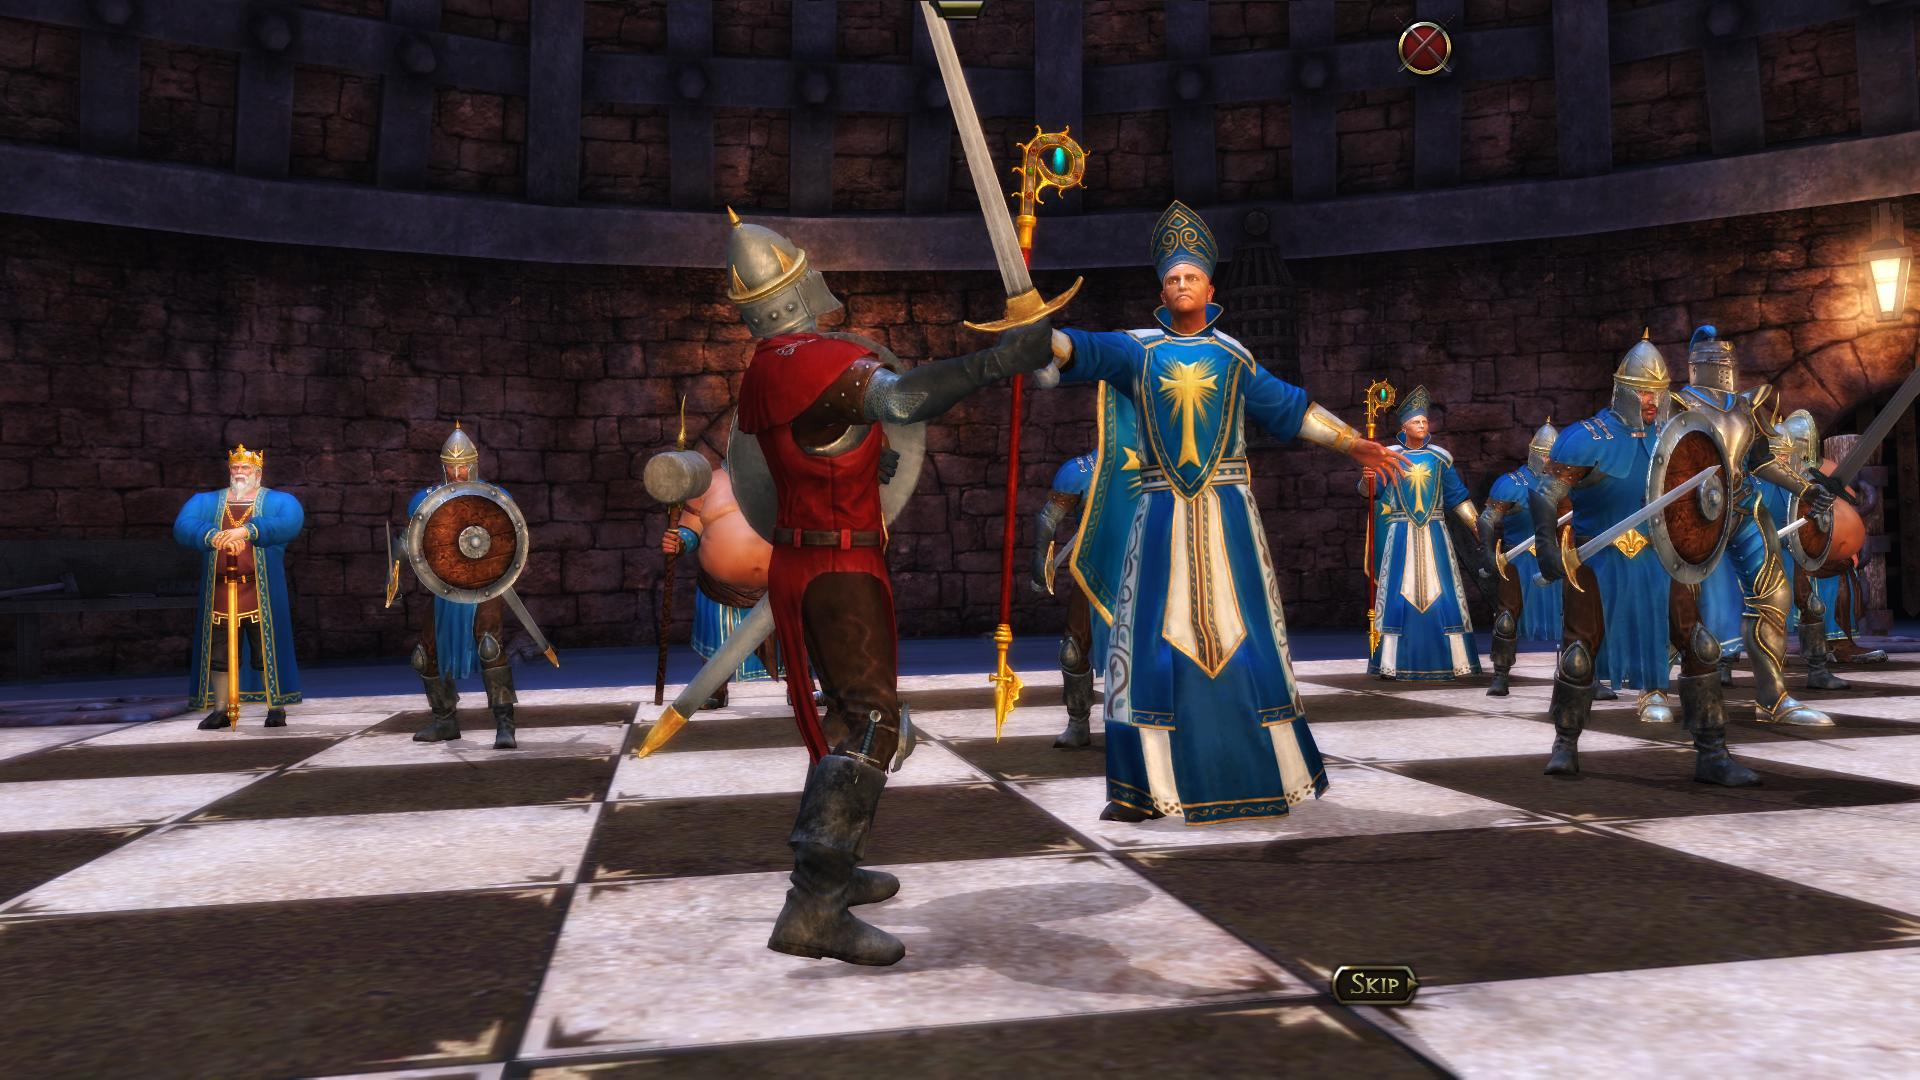 Battle chess game of kings hi2u skidrow games crack for Battle chess